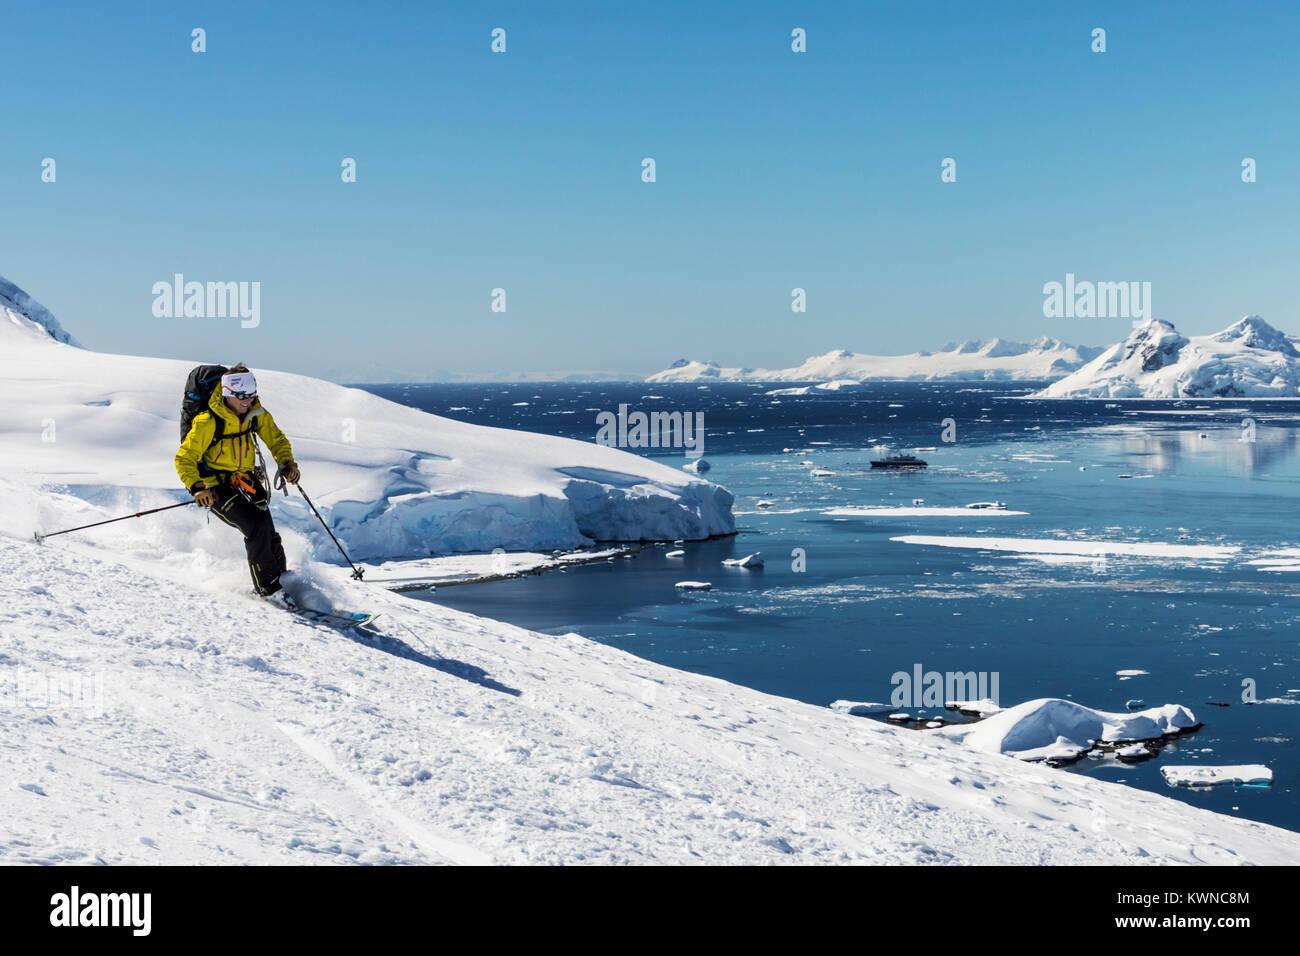 Alpine ski mountaineer skiing downhill; Nansen Island; Antarctica - Stock Image